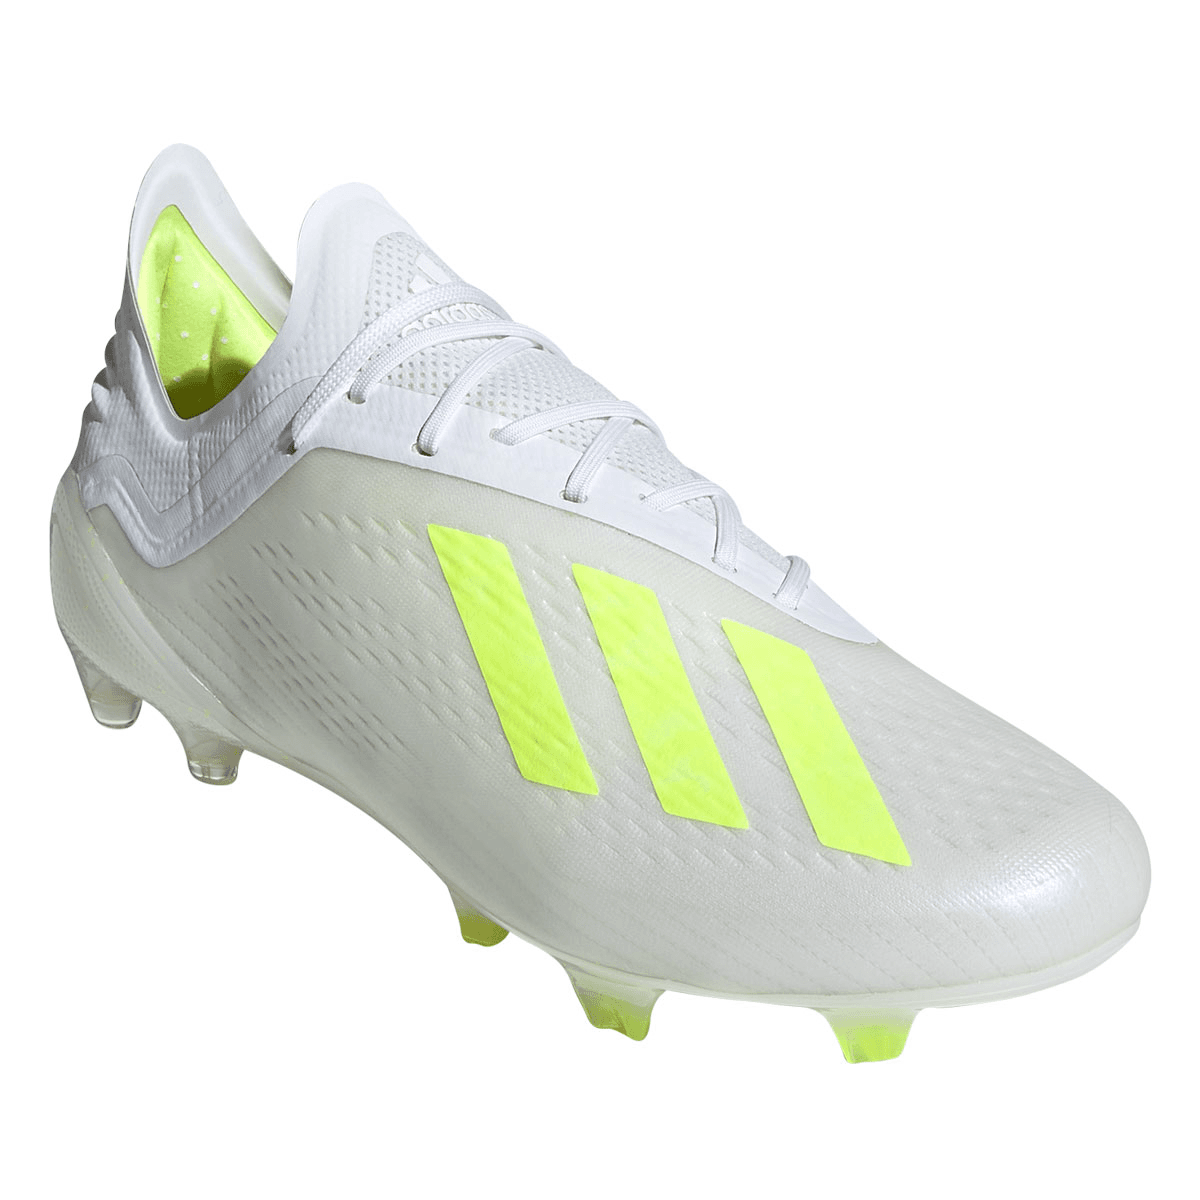 Adidas Fussballschuh X 18 1 Fg Weiss Gelb Fluo